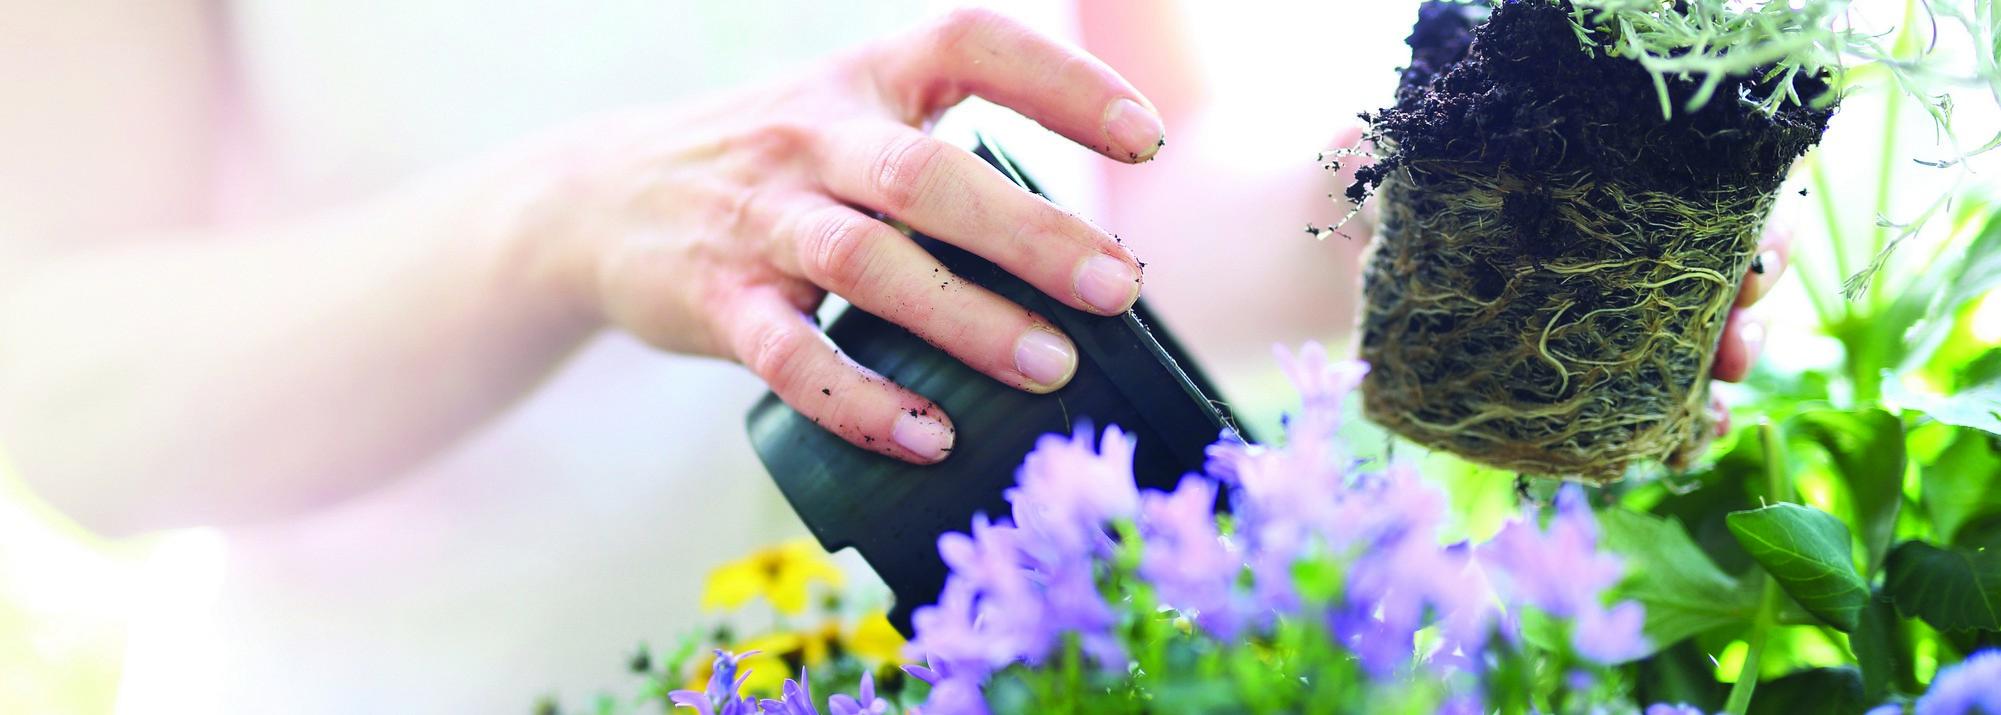 Adopter une déco fleurie